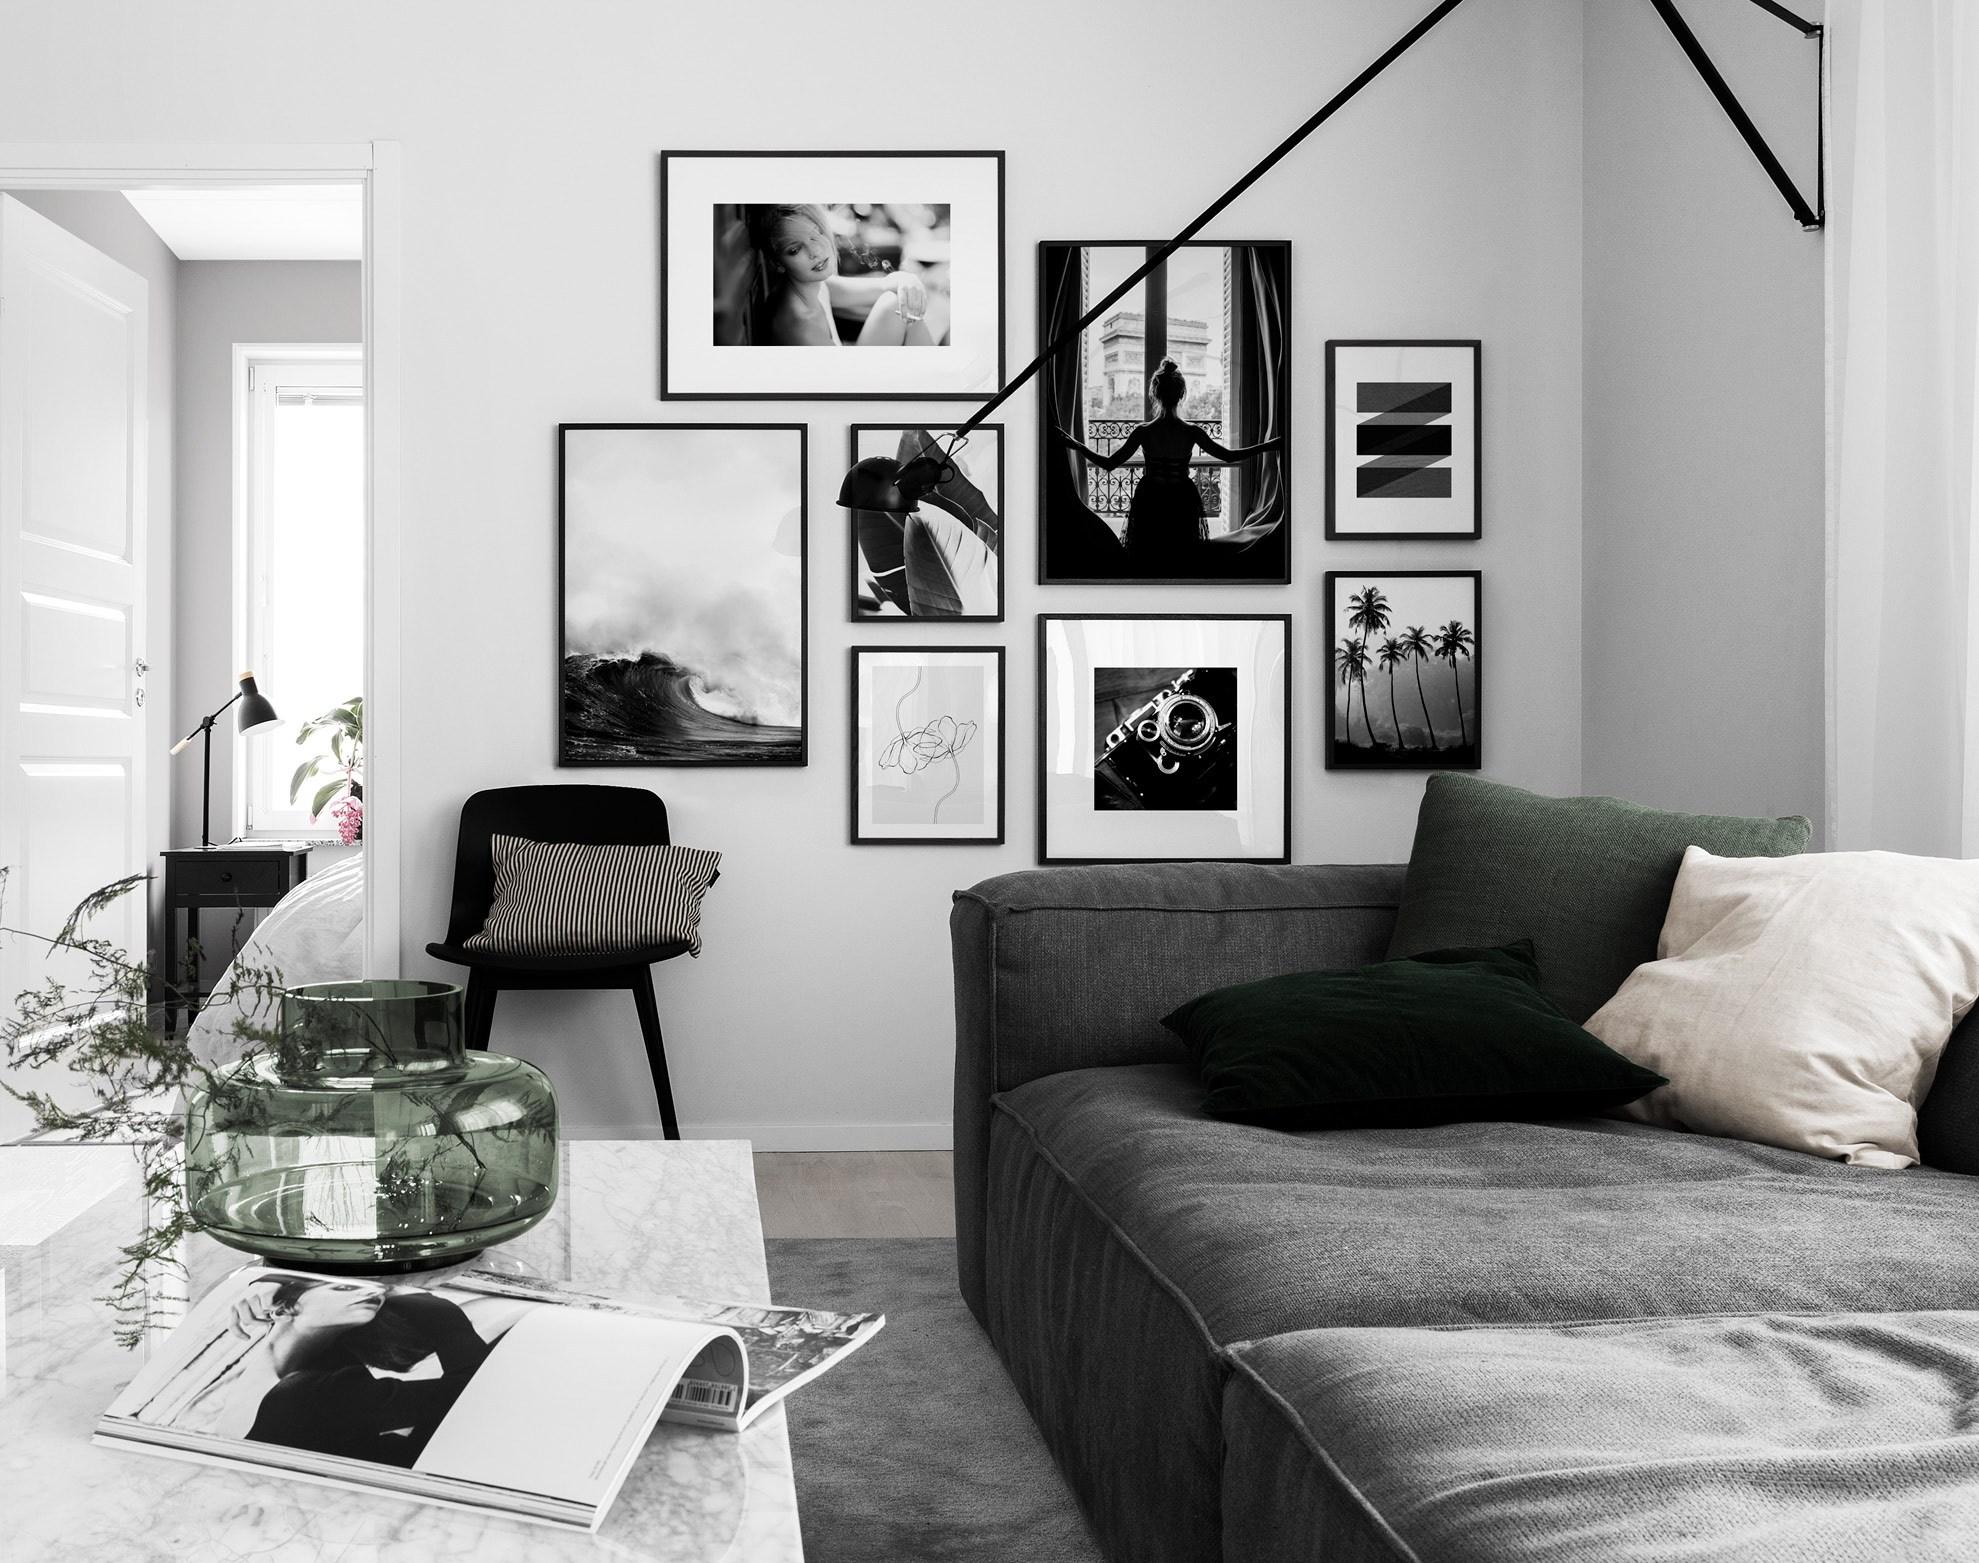 interiorlicious collage in de woonkamer